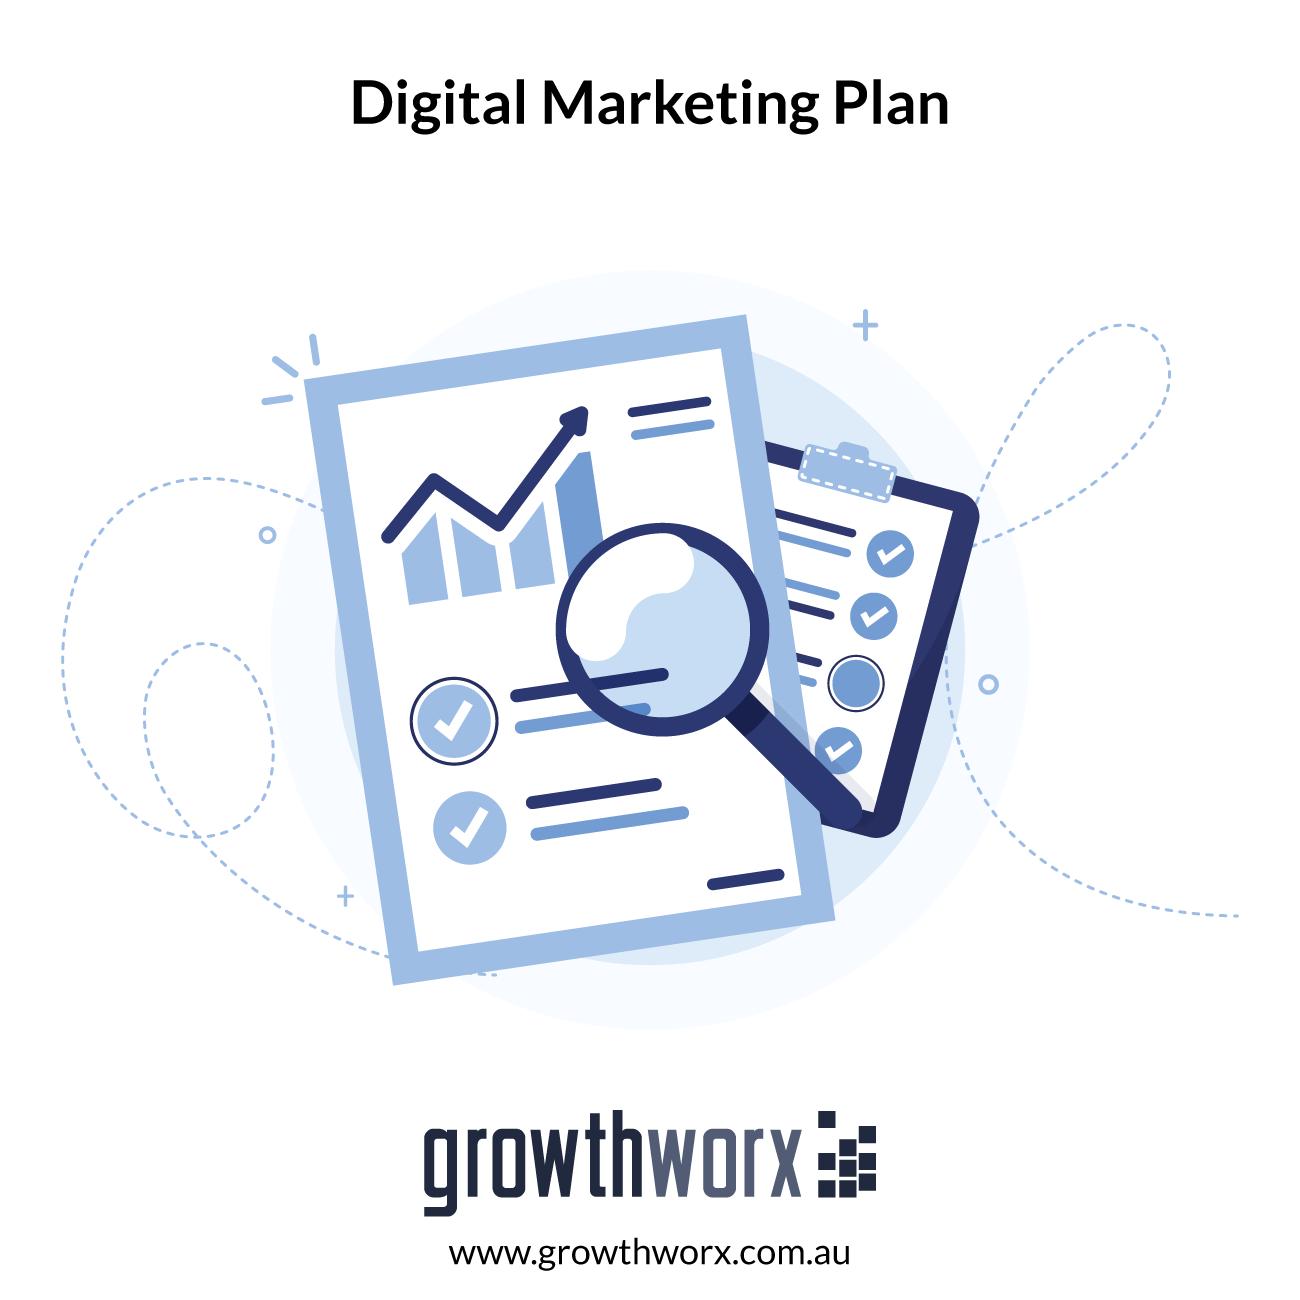 Create a basic digital marketing plan 1